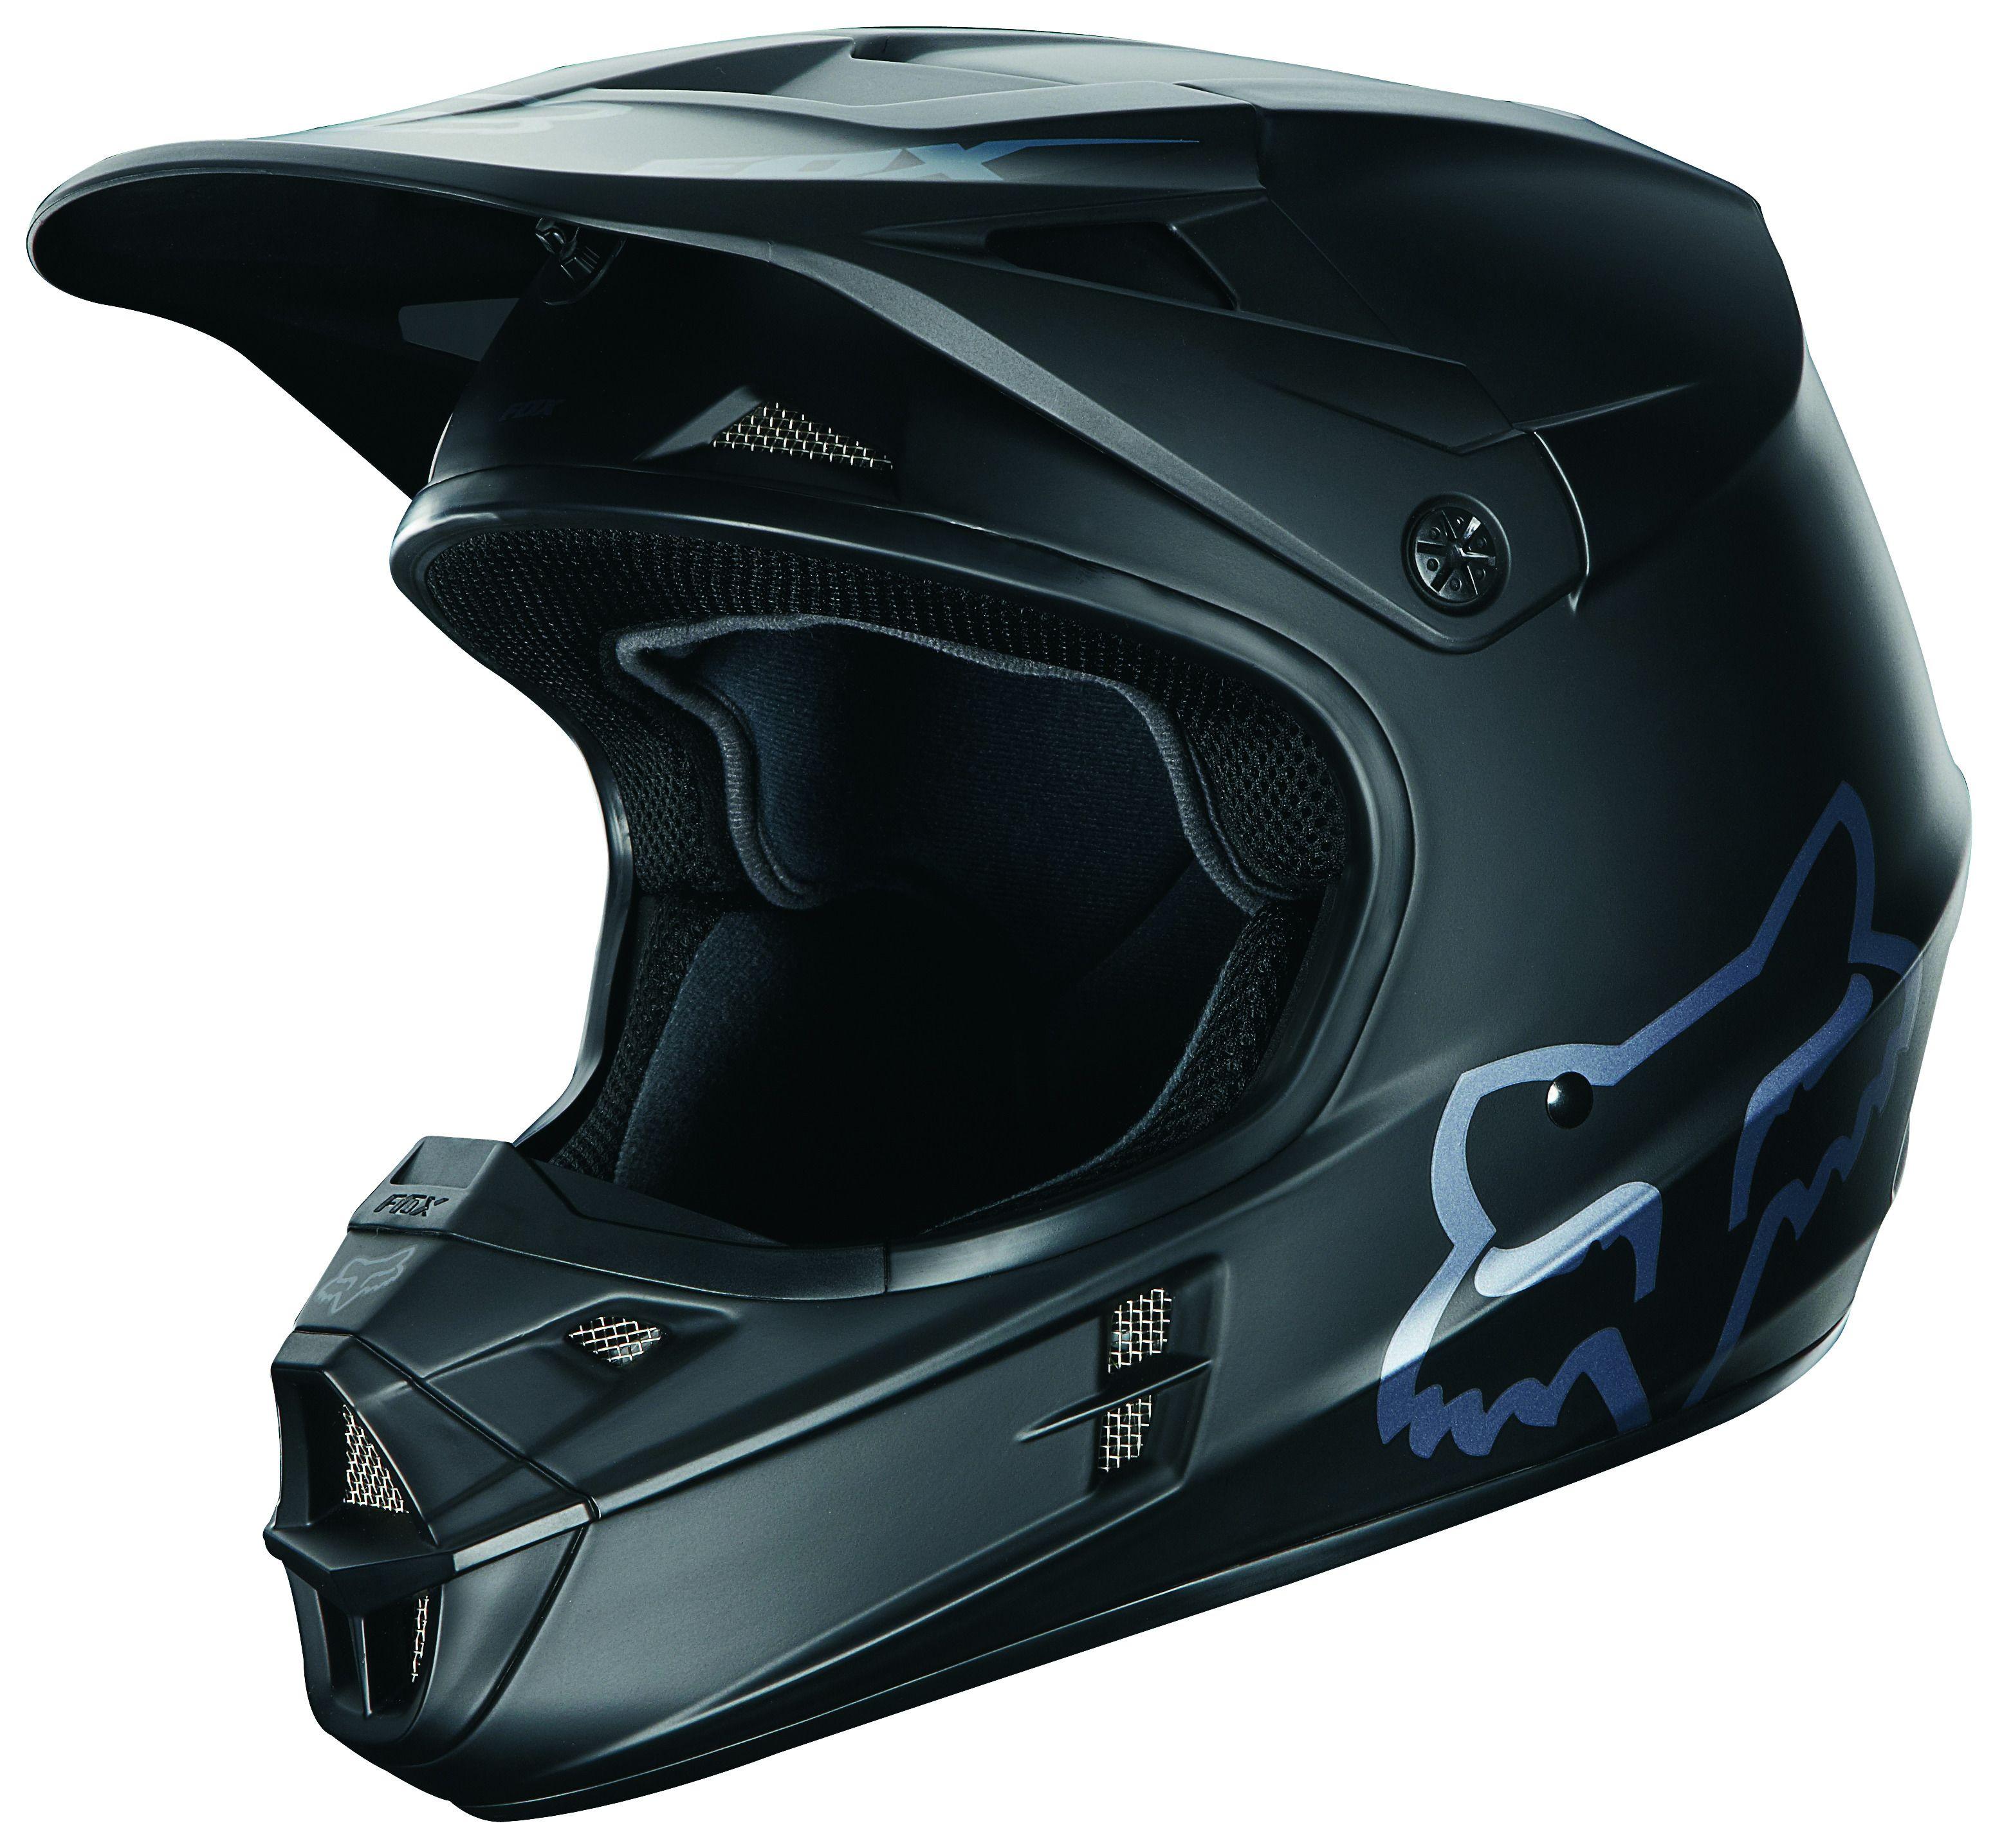 fox racing v1 matte black helmet revzilla. Black Bedroom Furniture Sets. Home Design Ideas